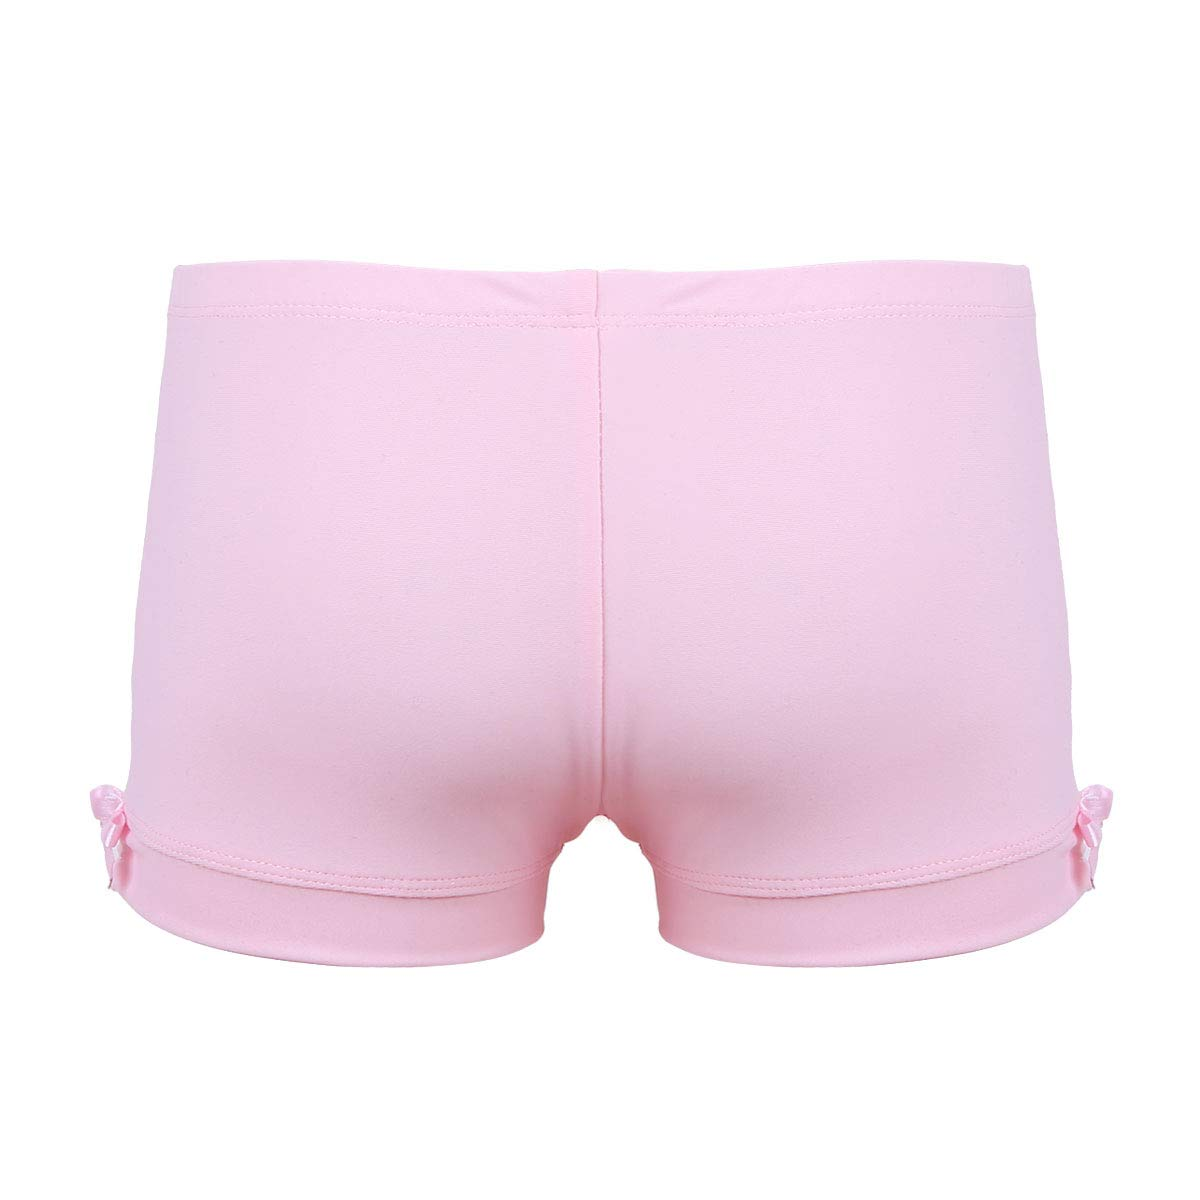 Agoky Kids Girls Gymnastics Workout Yoga Athletic Sports Training Bike Short Pink Boy-Cut 3 by Agoky (Image #3)